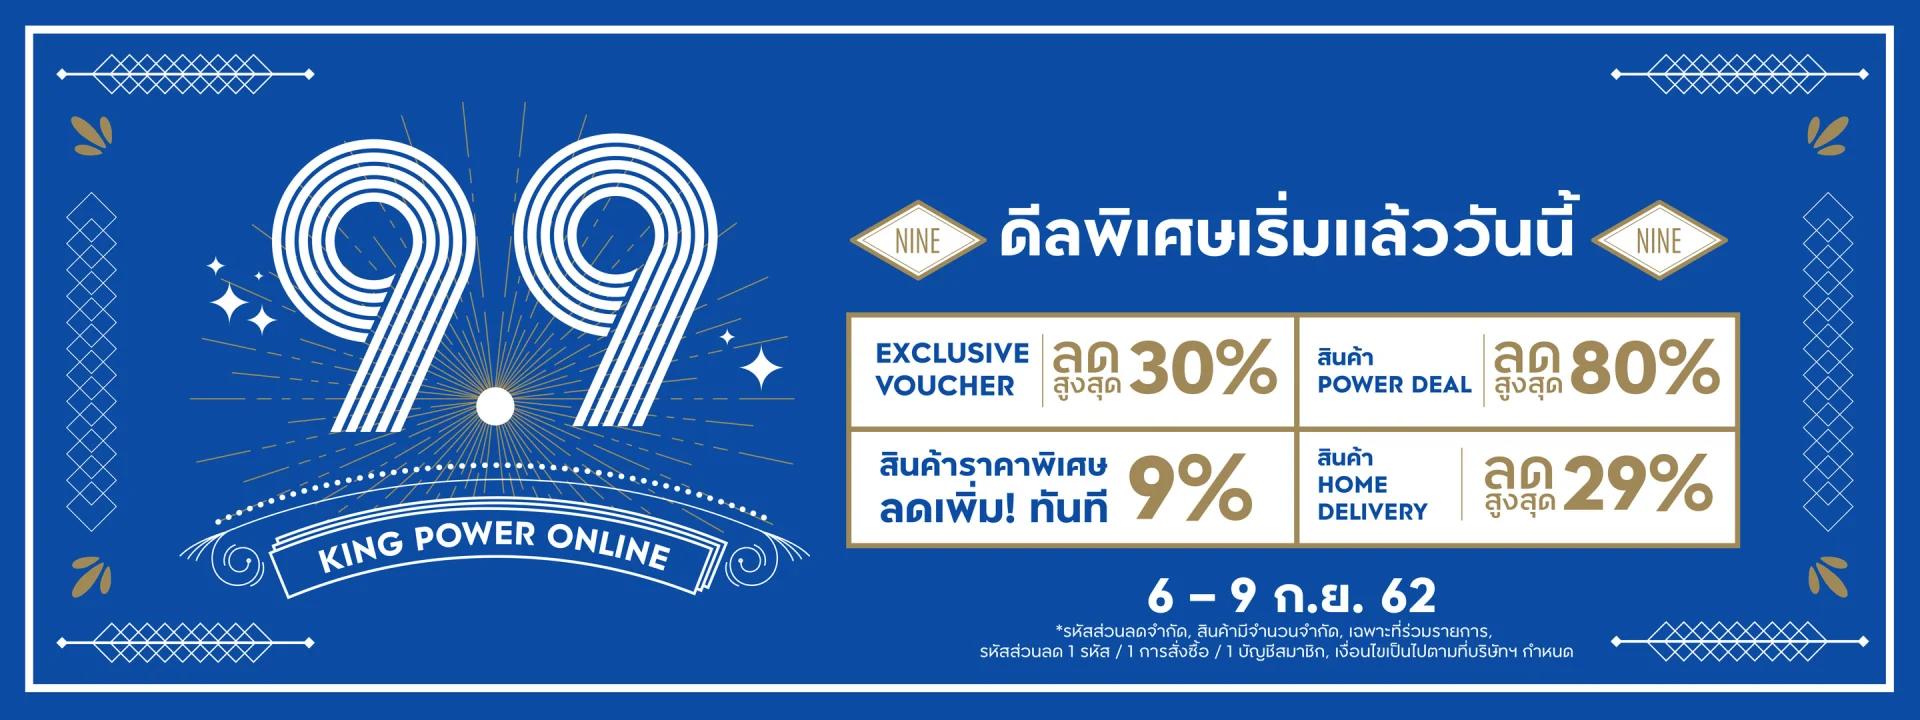 kingpoweronline-promotion